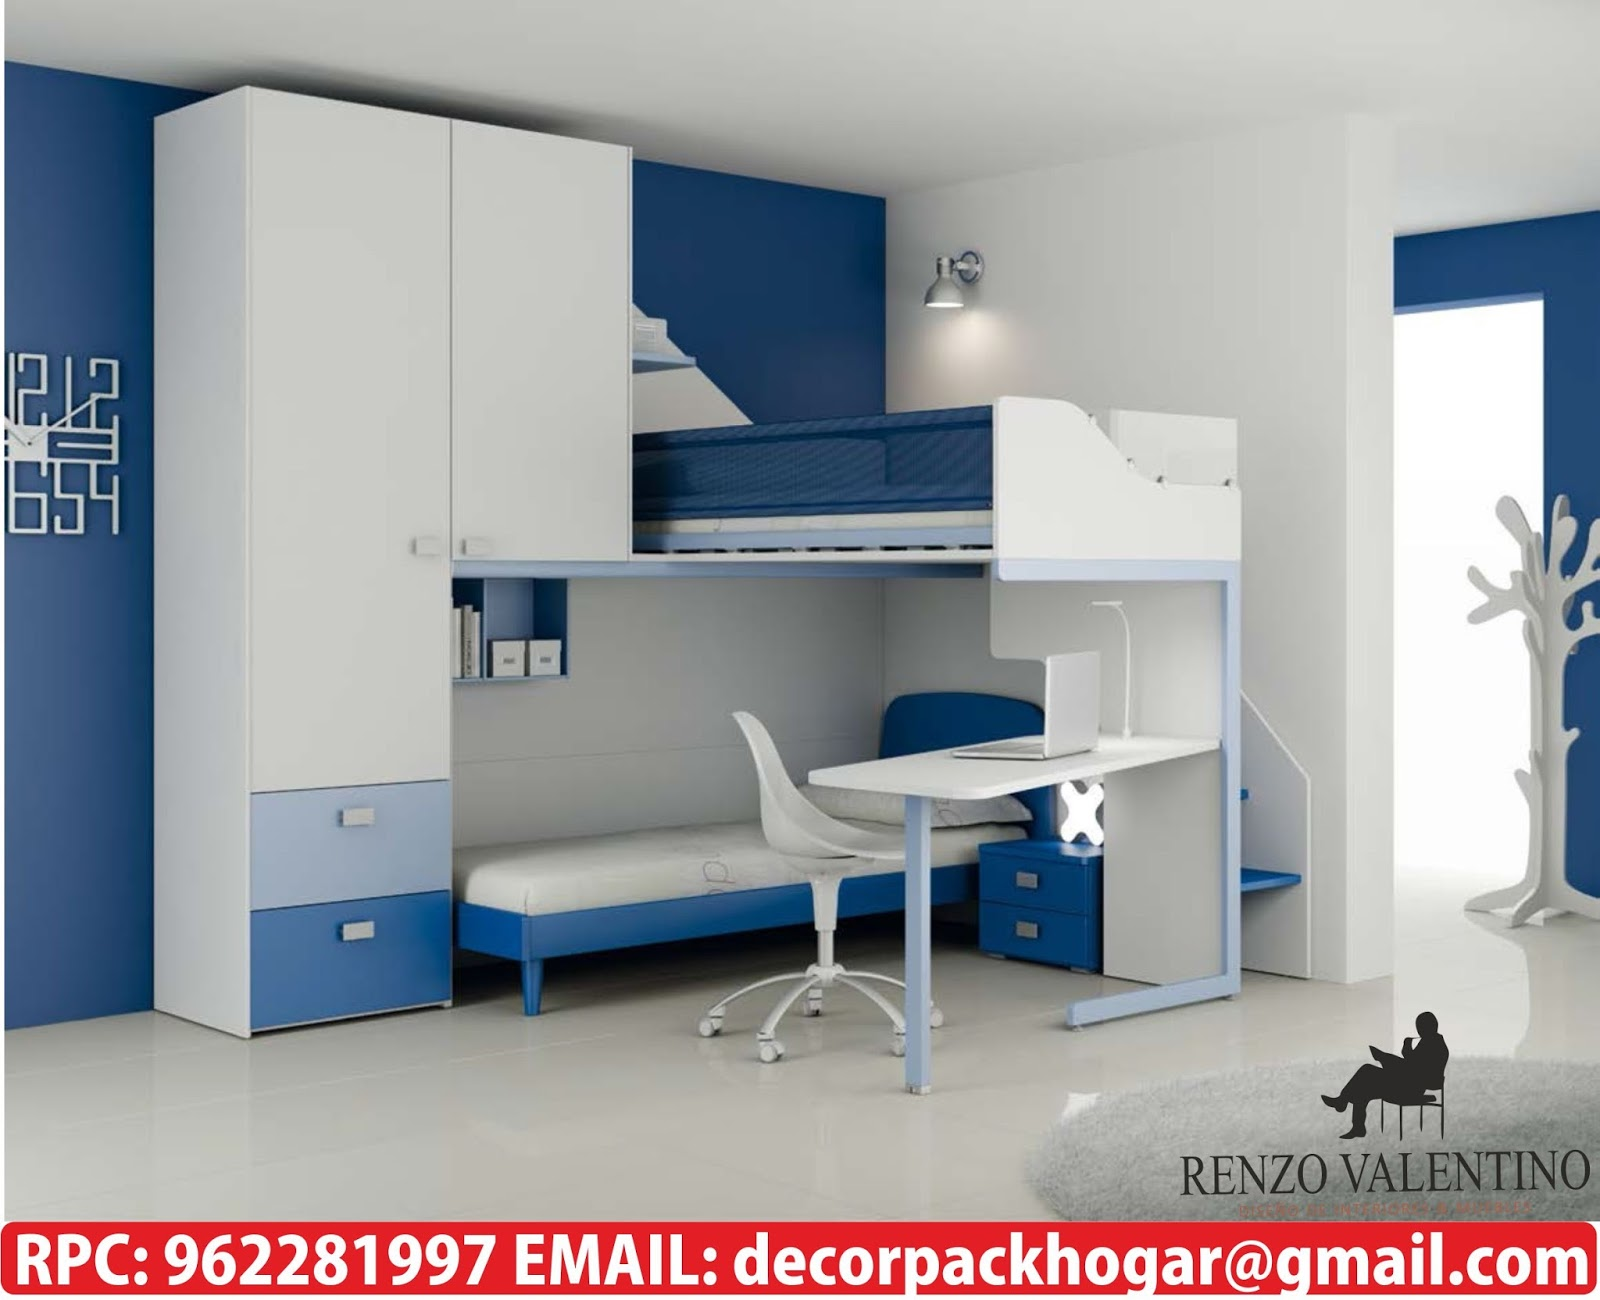 Dise os fabricacion de closet cocina y muebles de oficina for Amoblar departamentos pequenos